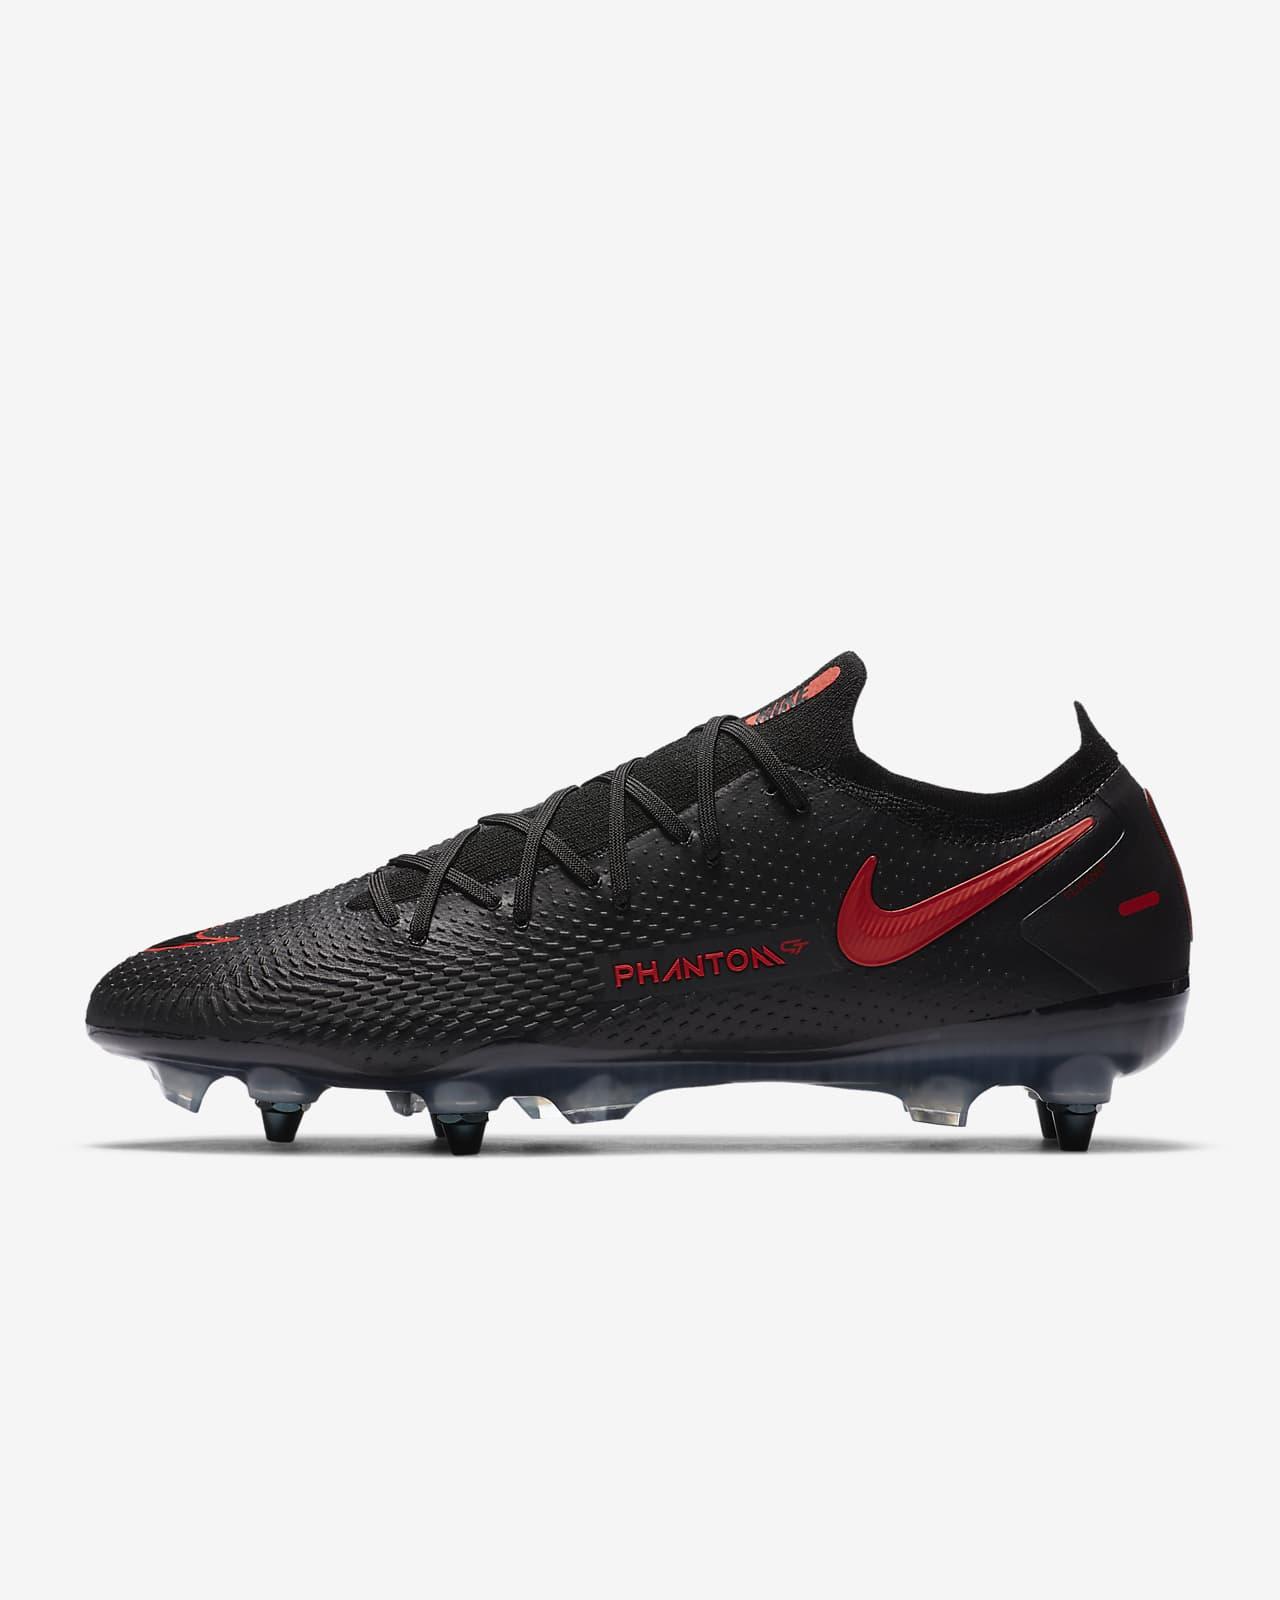 Chaussure de football à crampons pour terrain gras Nike Phantom GT Elite SG Pro AC